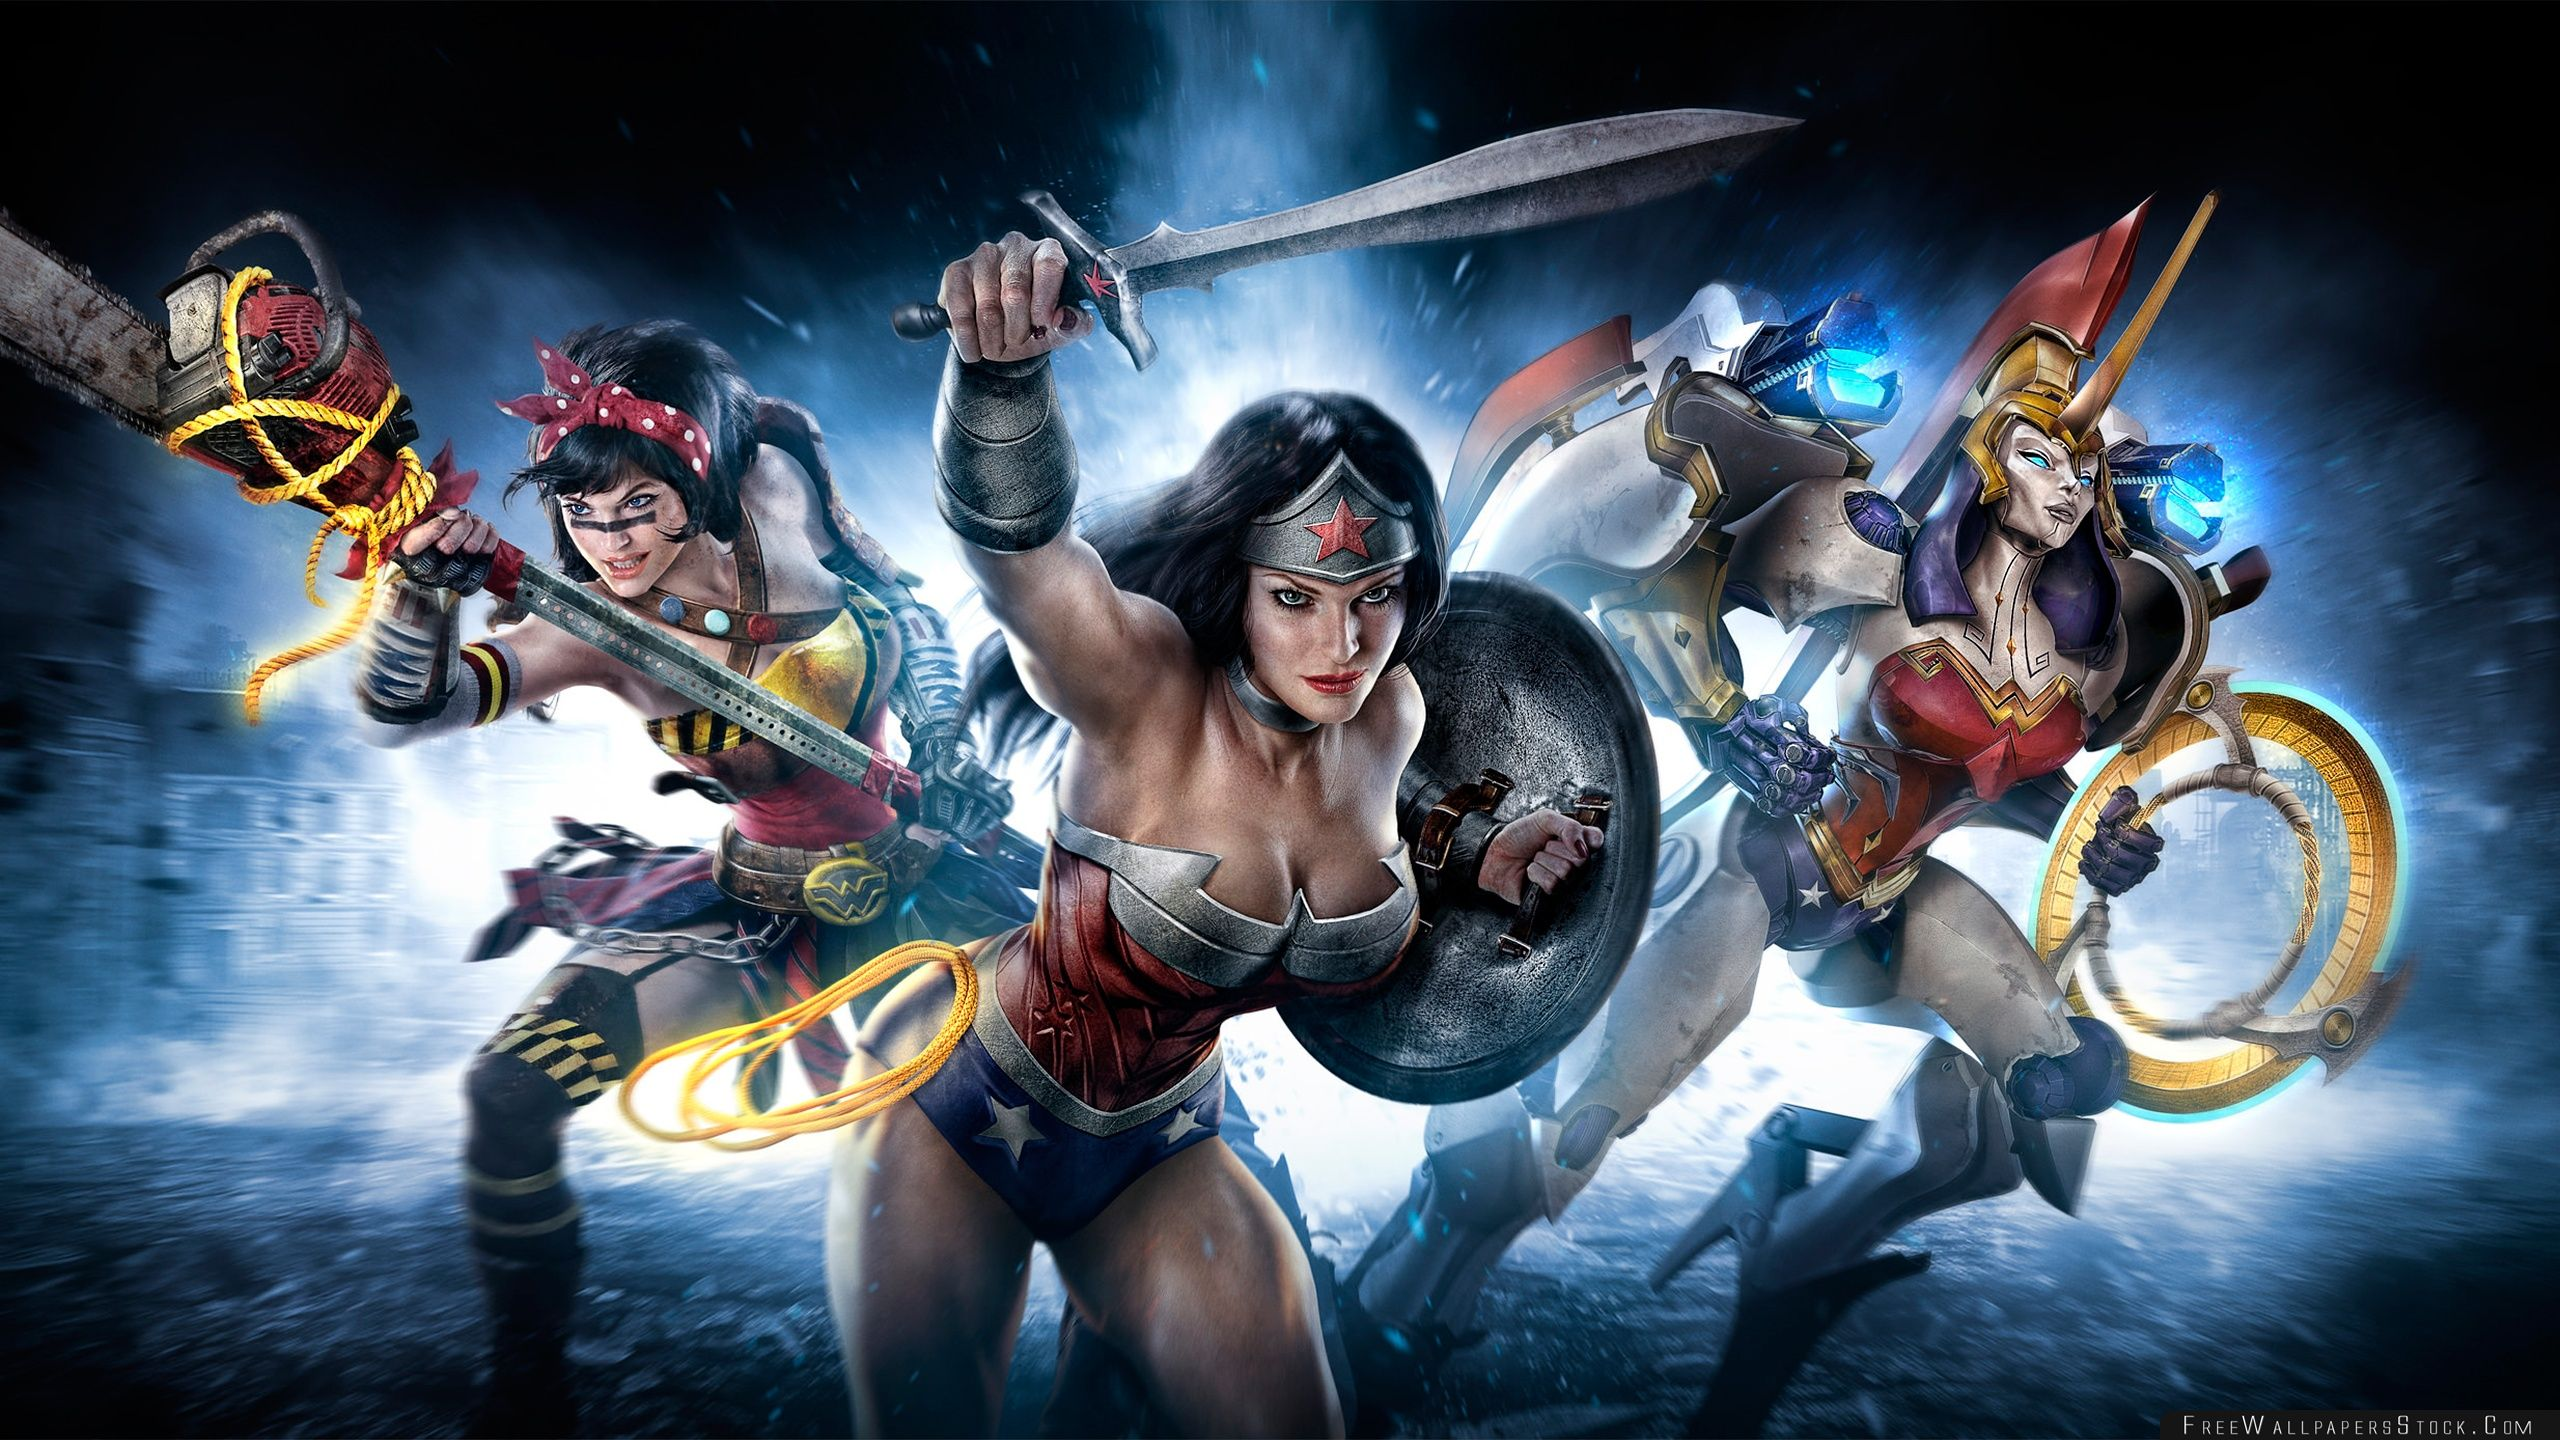 Download Free Wallpaper Wonder Woman